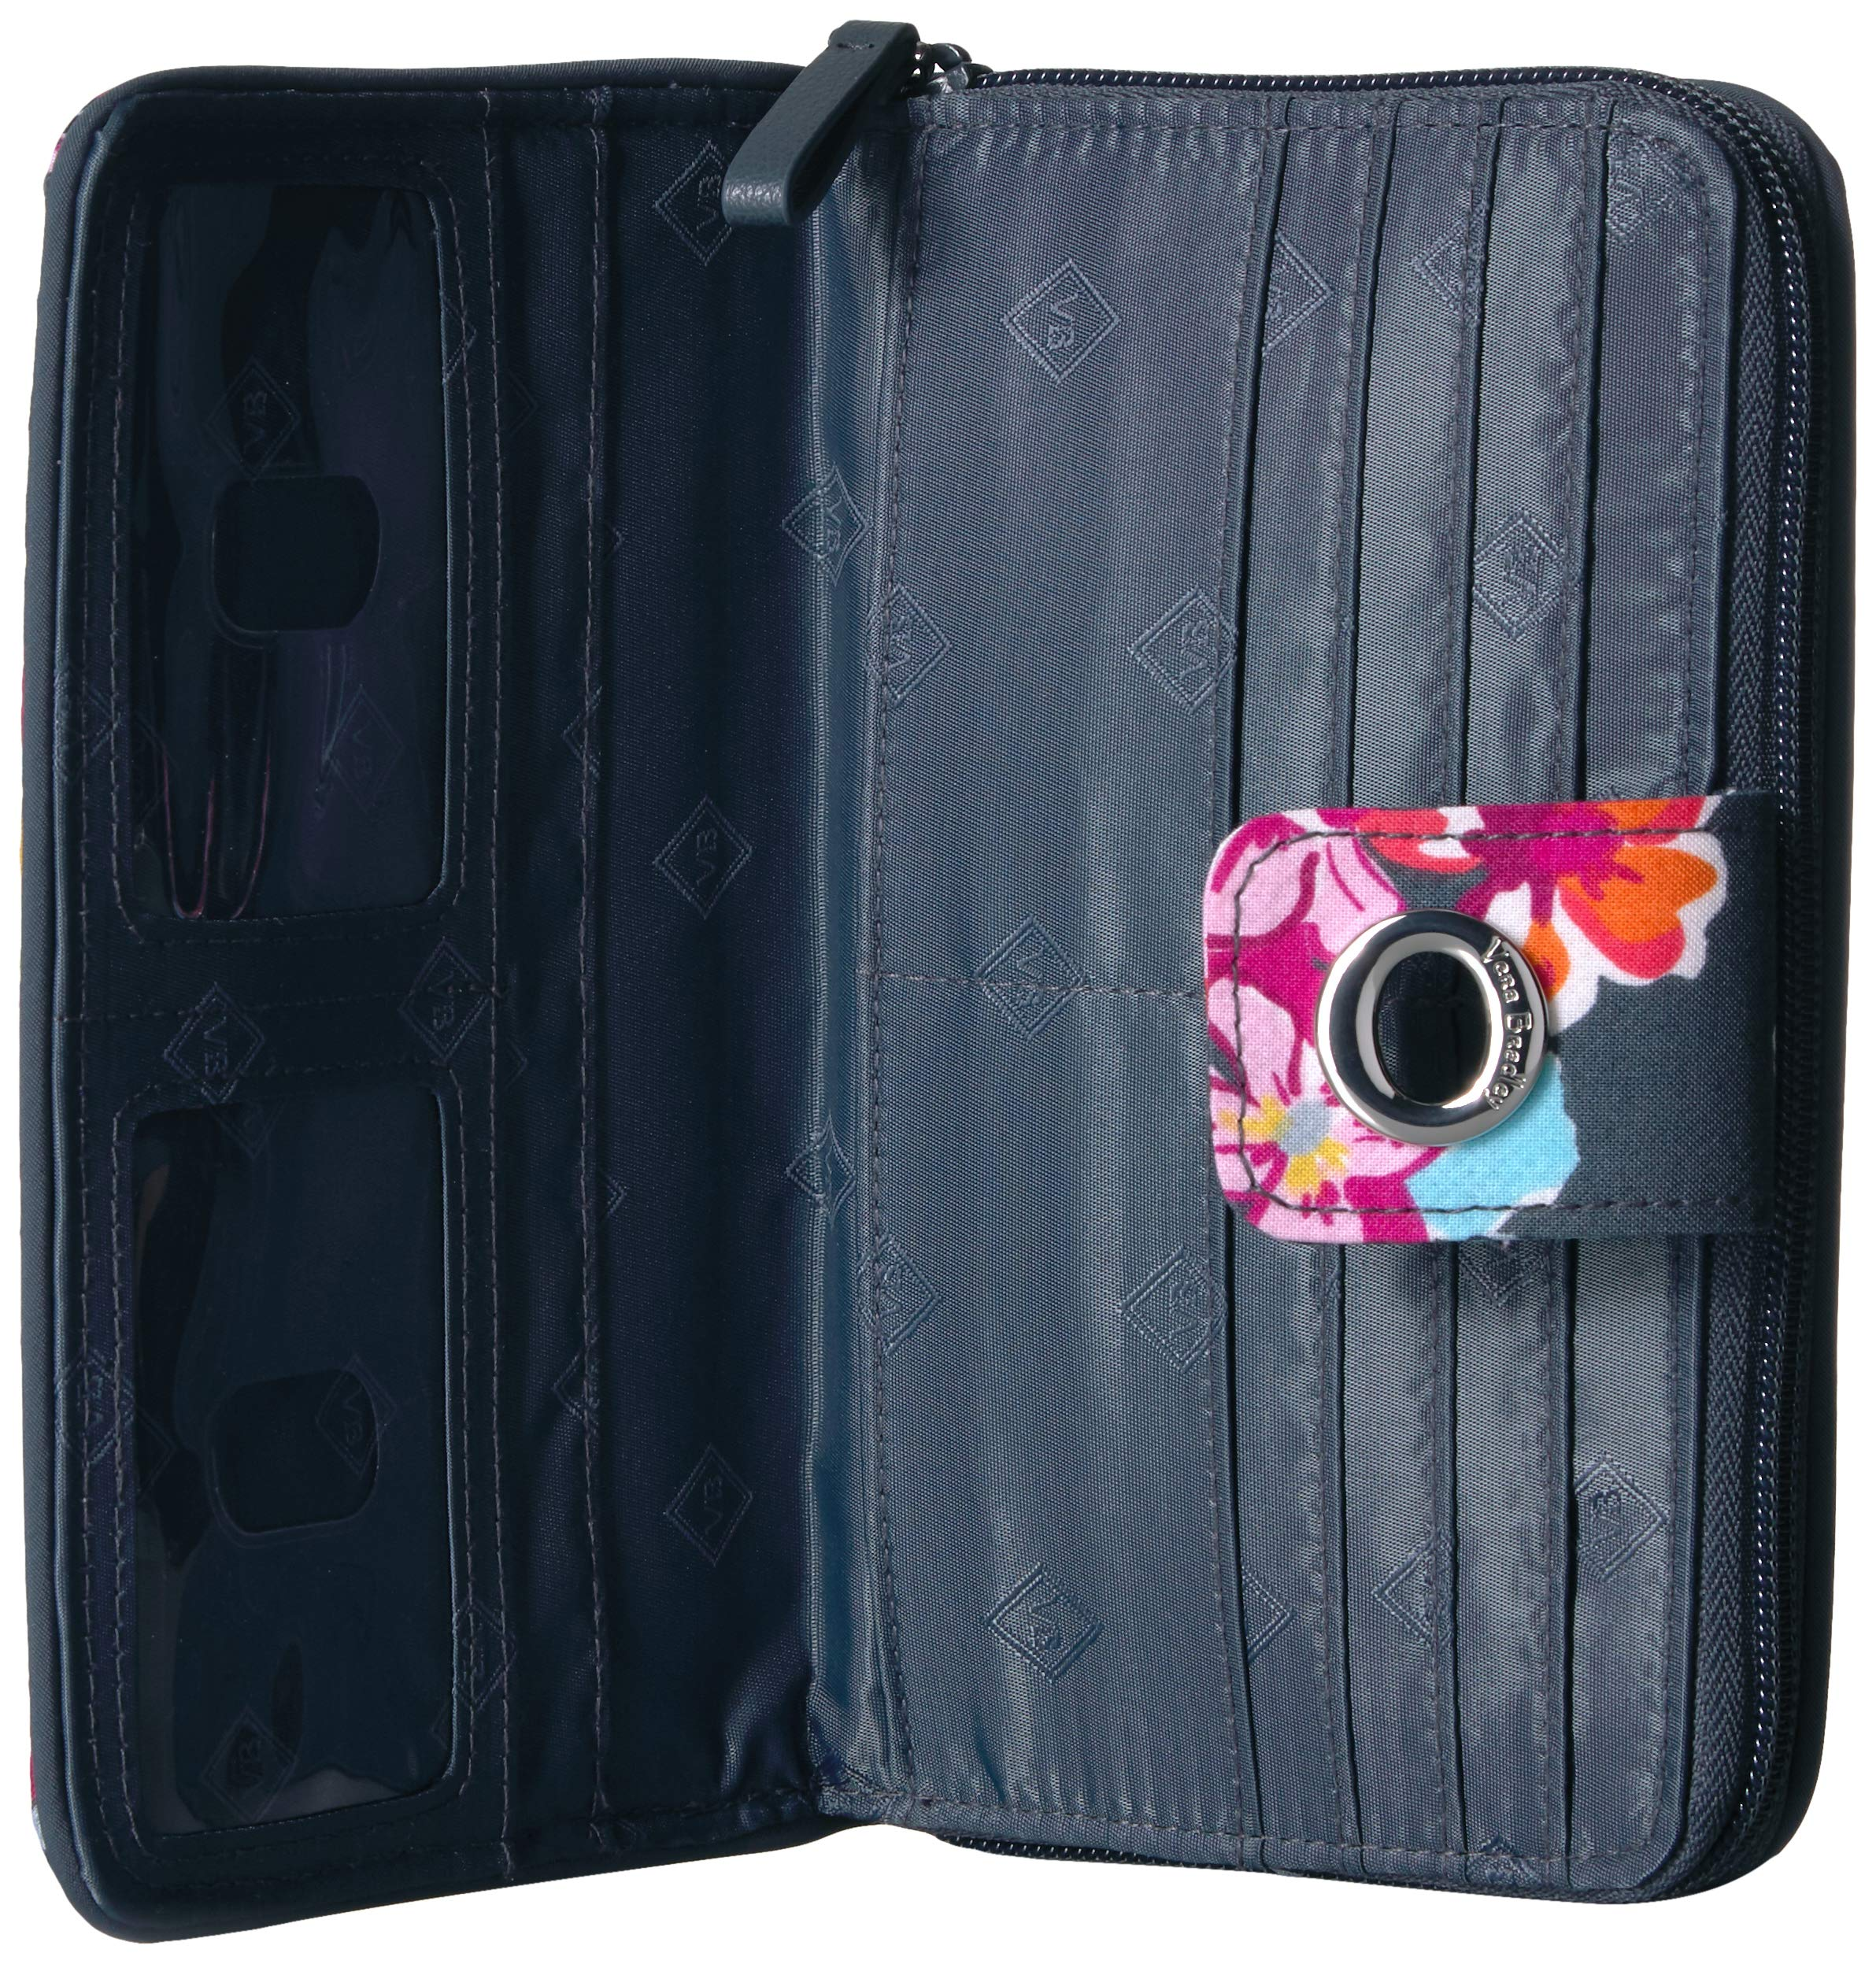 Vera Bradley Iconic RFID Turnlock Wallet, Signature Cotton, pretty Posies by Vera Bradley (Image #4)